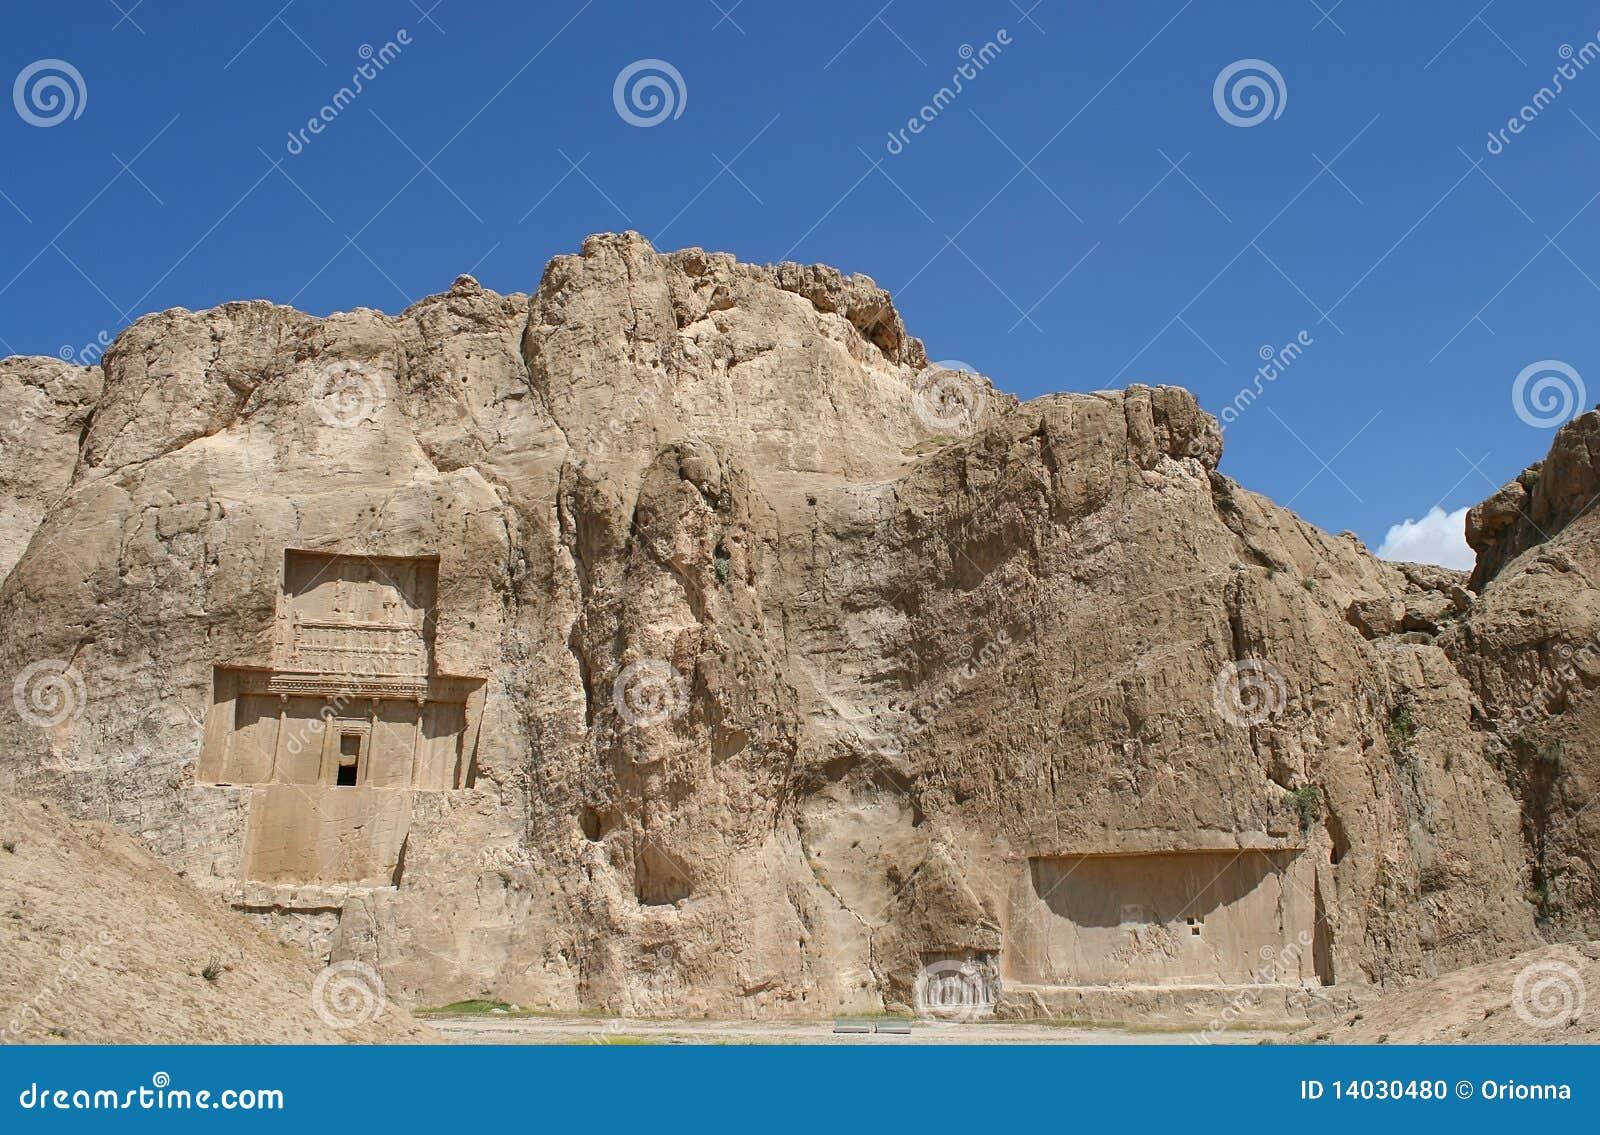 Grave of king Daeiros near Persepolis